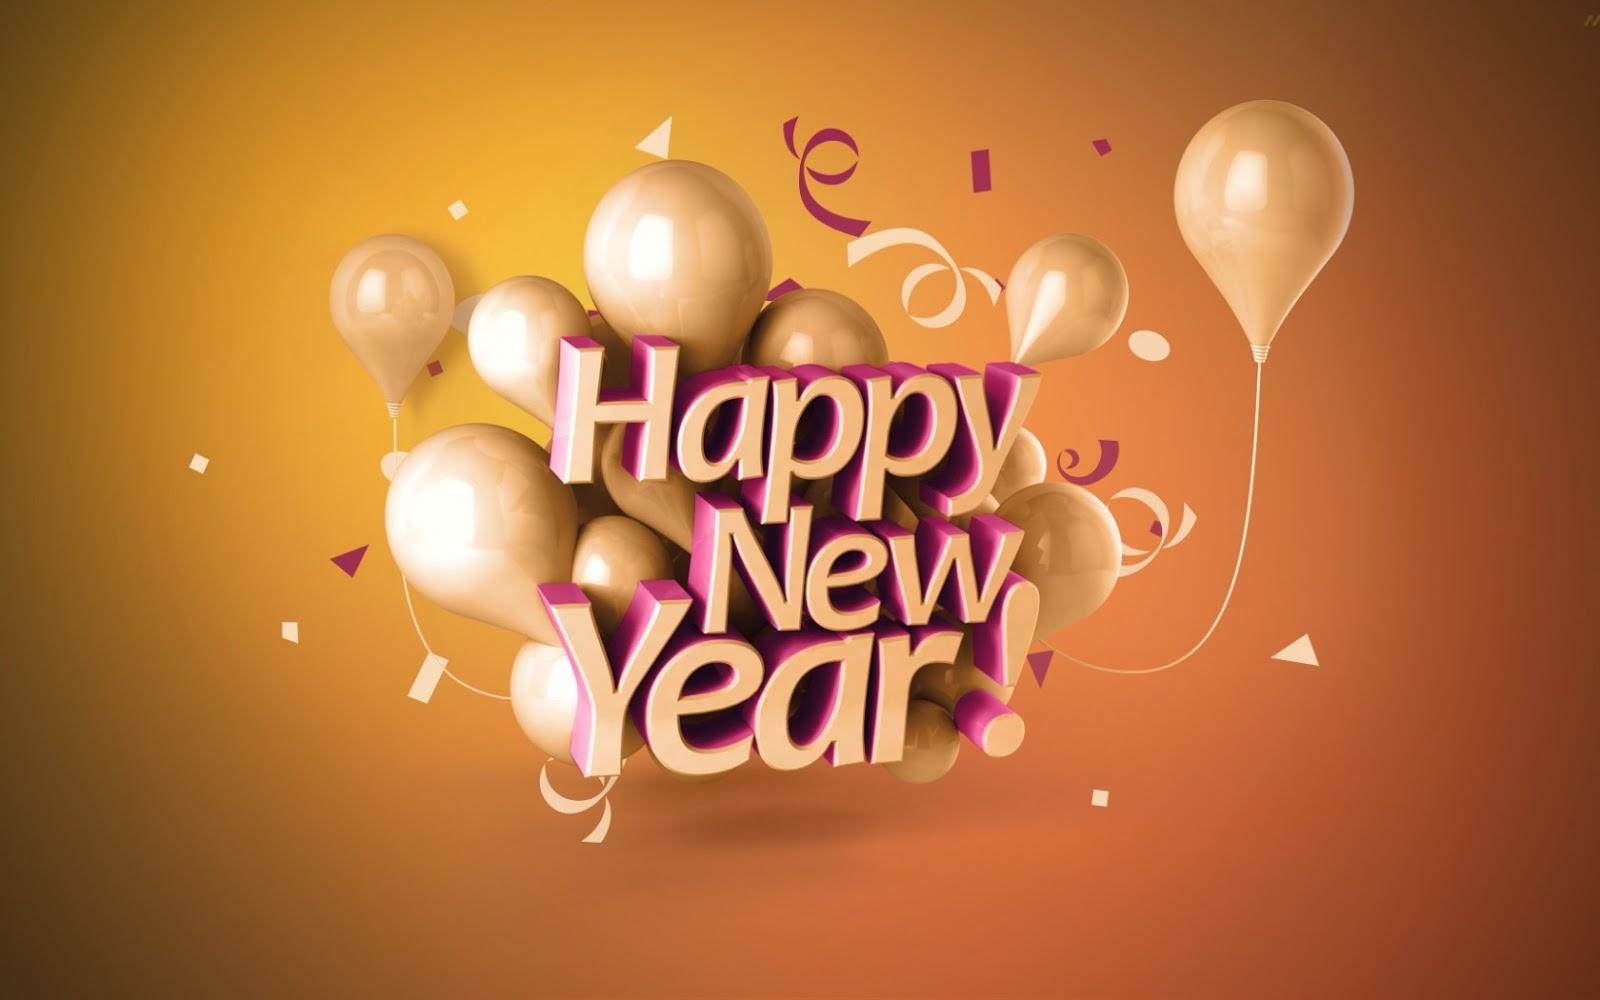 Wish You A Happy New Year 2018 English Hindi All Language